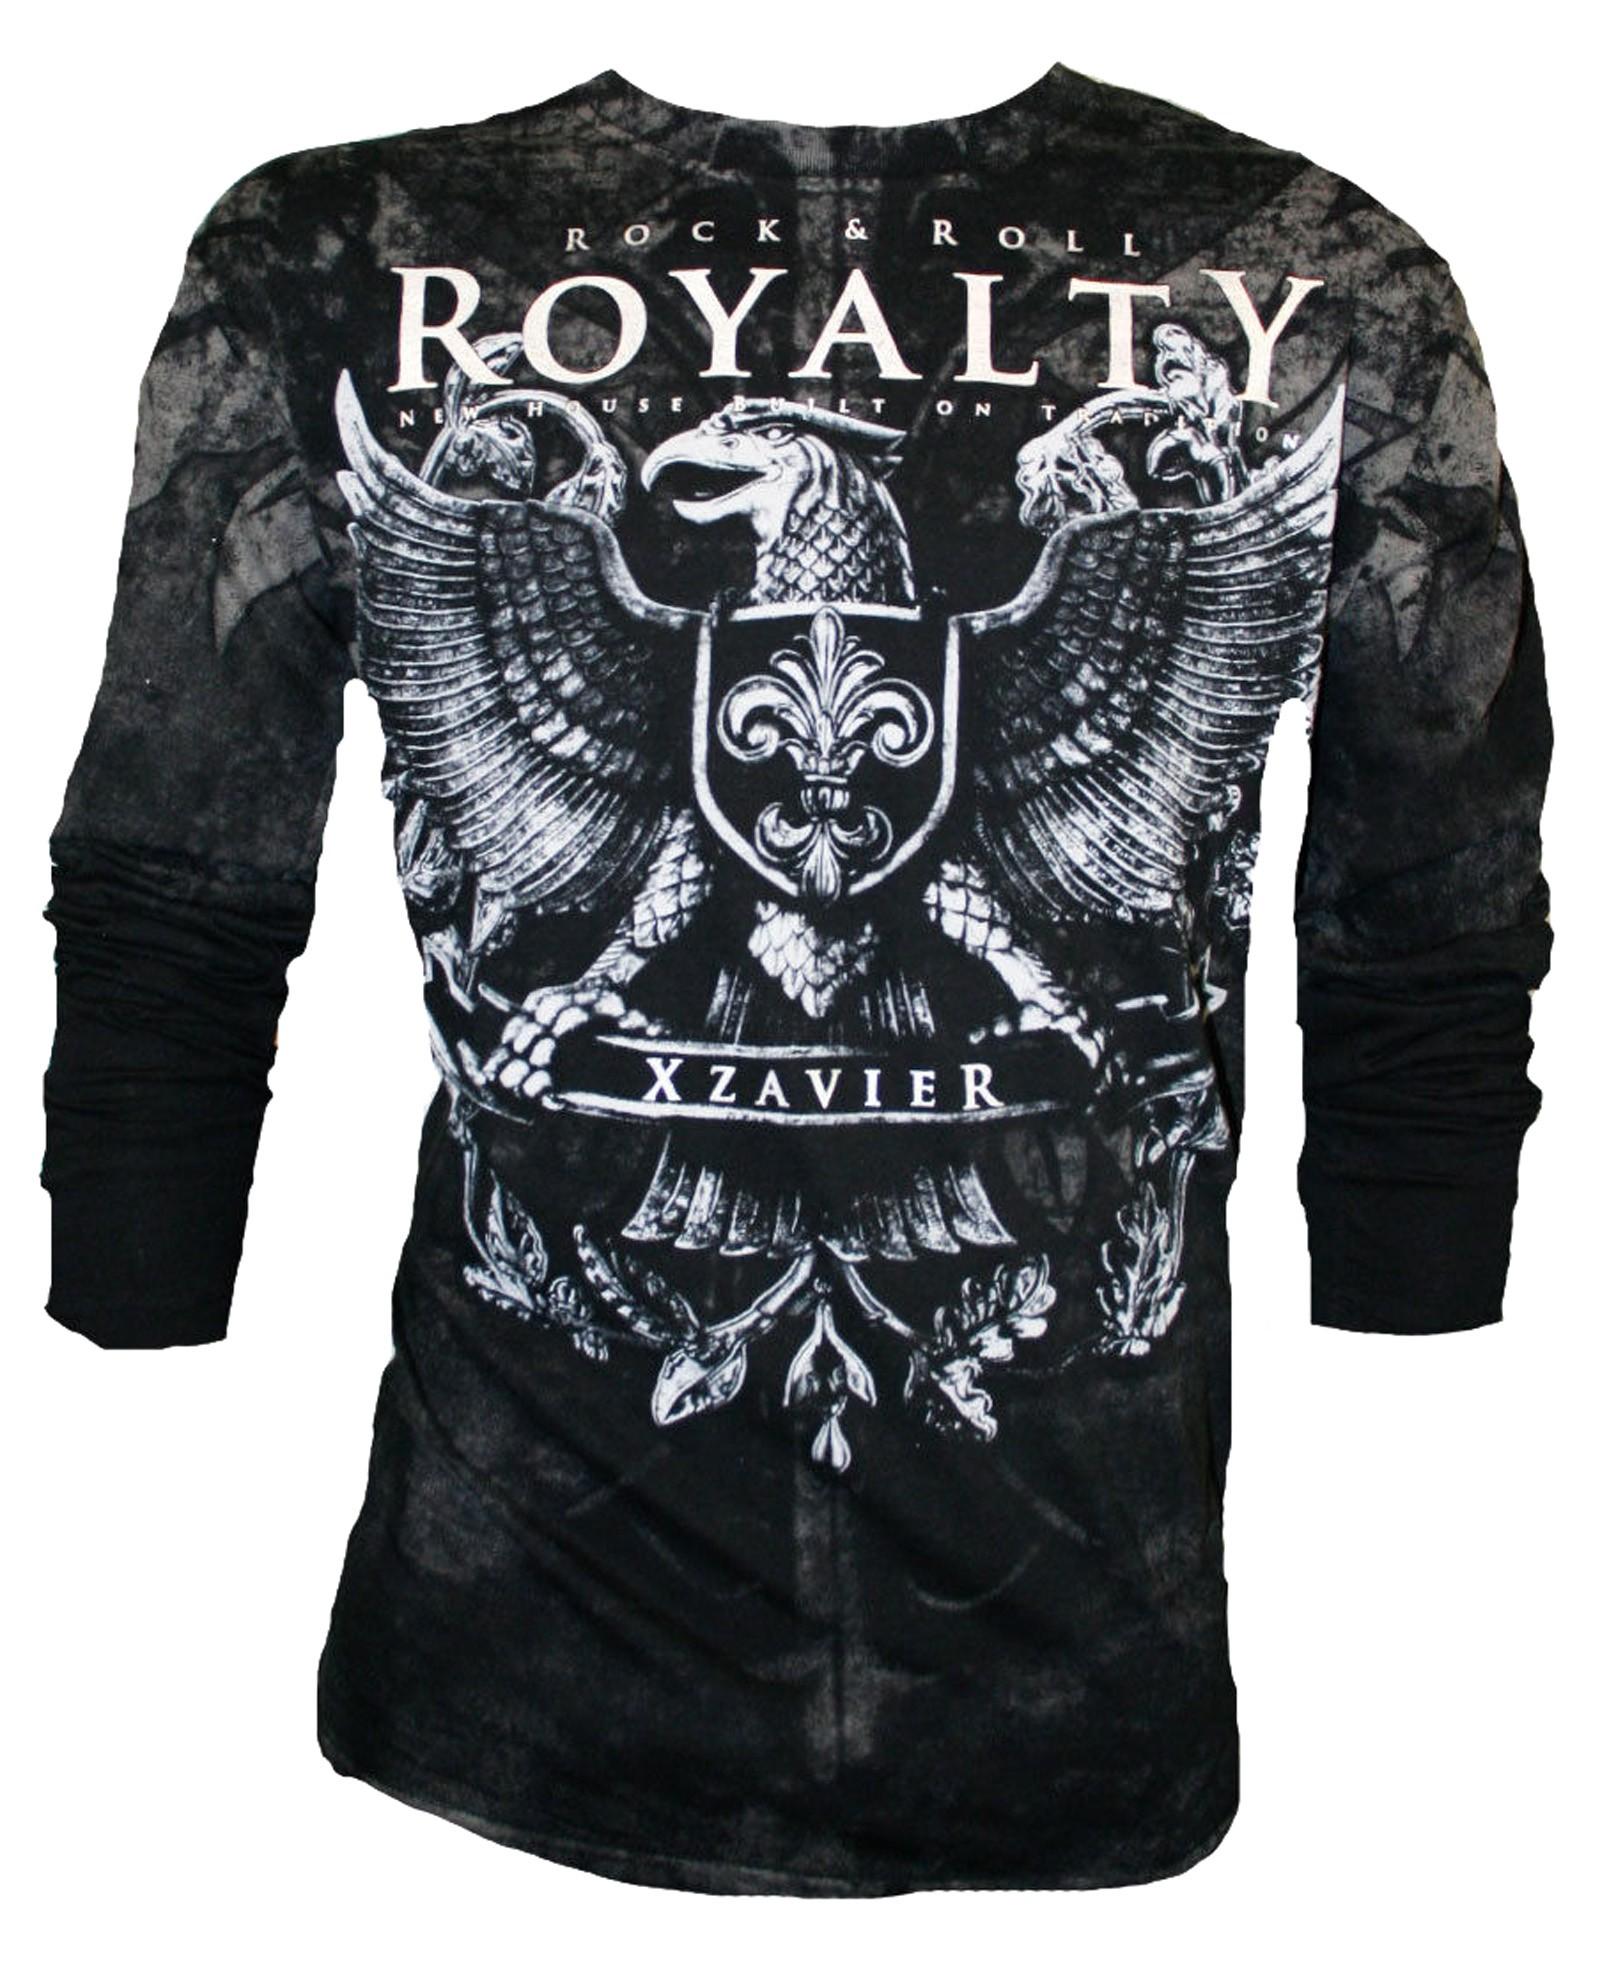 Xzavier - Royalty Longsleeve T-Shirt Front